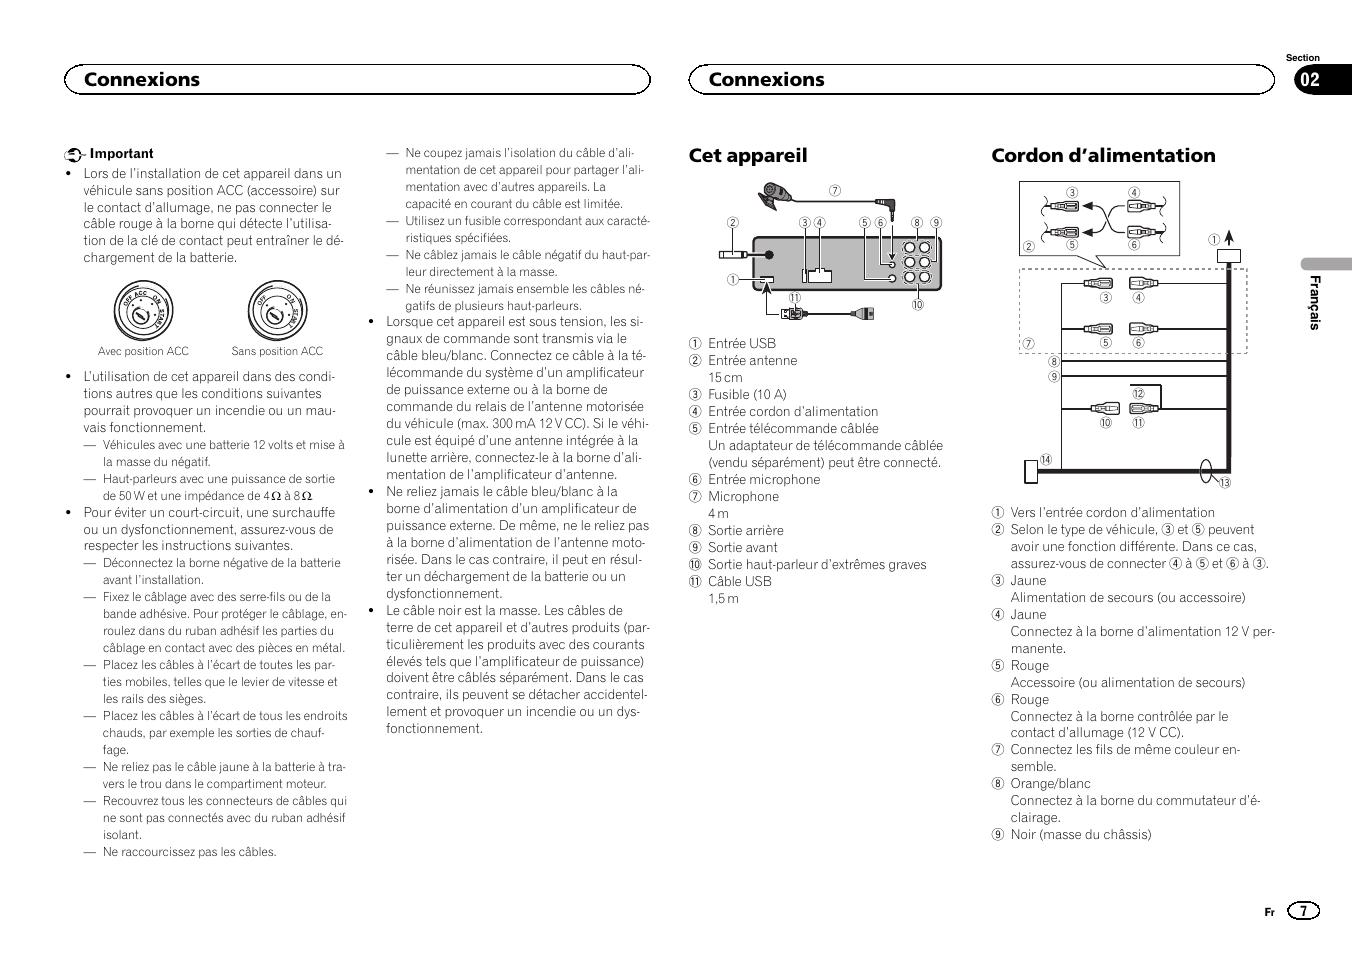 cet appareil cordon d alimentation connexions pioneer deh rh manualsdir com Pioneer Deh 6400Bt Wiring Pioneer Deh 6400Bt Manual PDF